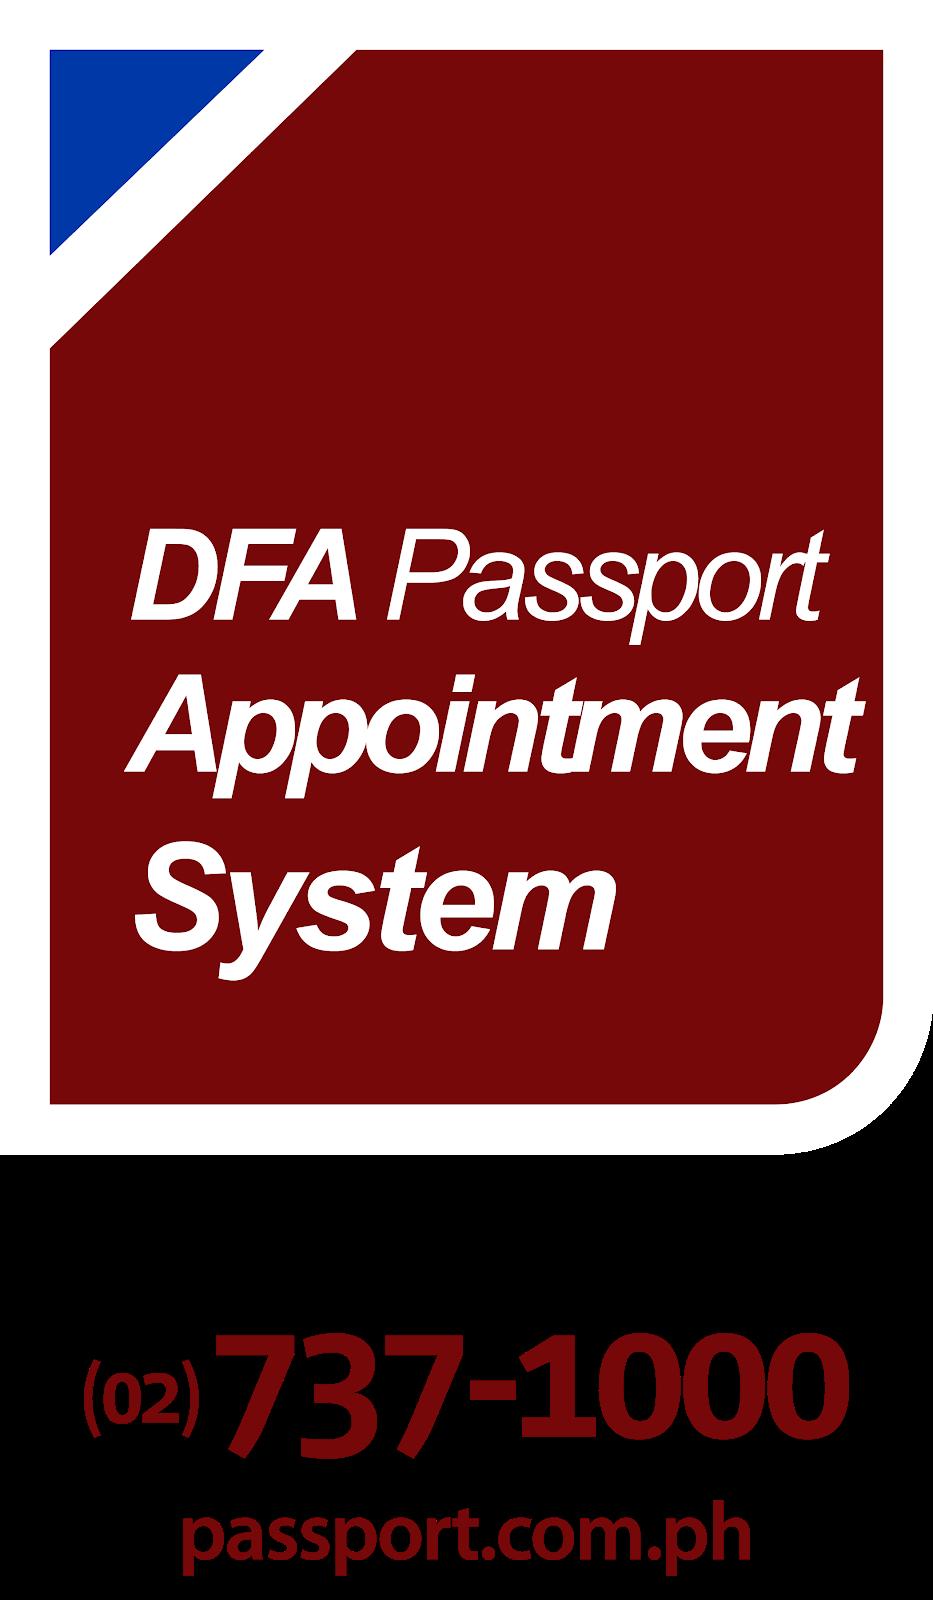 Form new form for dfa passport application passport dfa form for application passport appointment system in clark dfa dfa passport appointment falaconquin